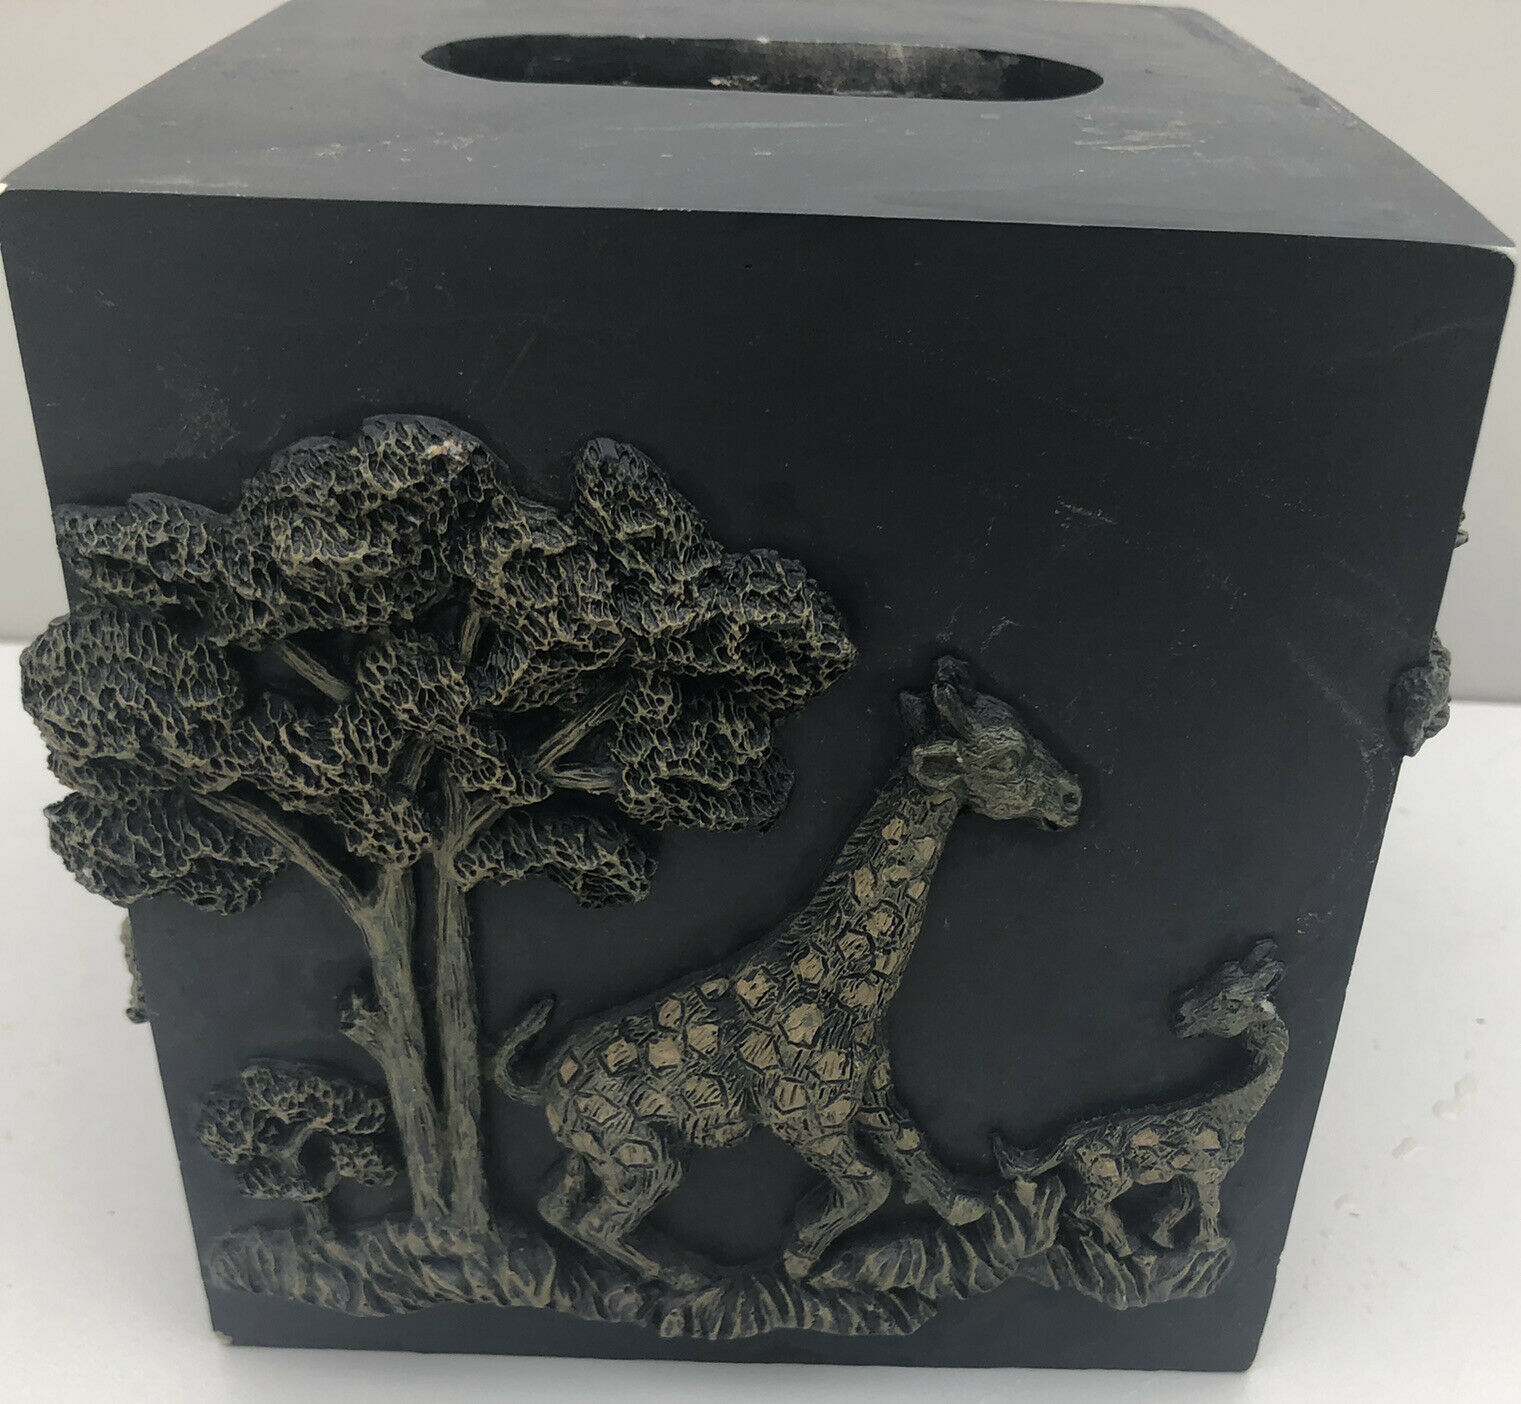 African Safari Wildlife Tissue Cover Box Elephant Giraffe Leopard Rhino Black 3D